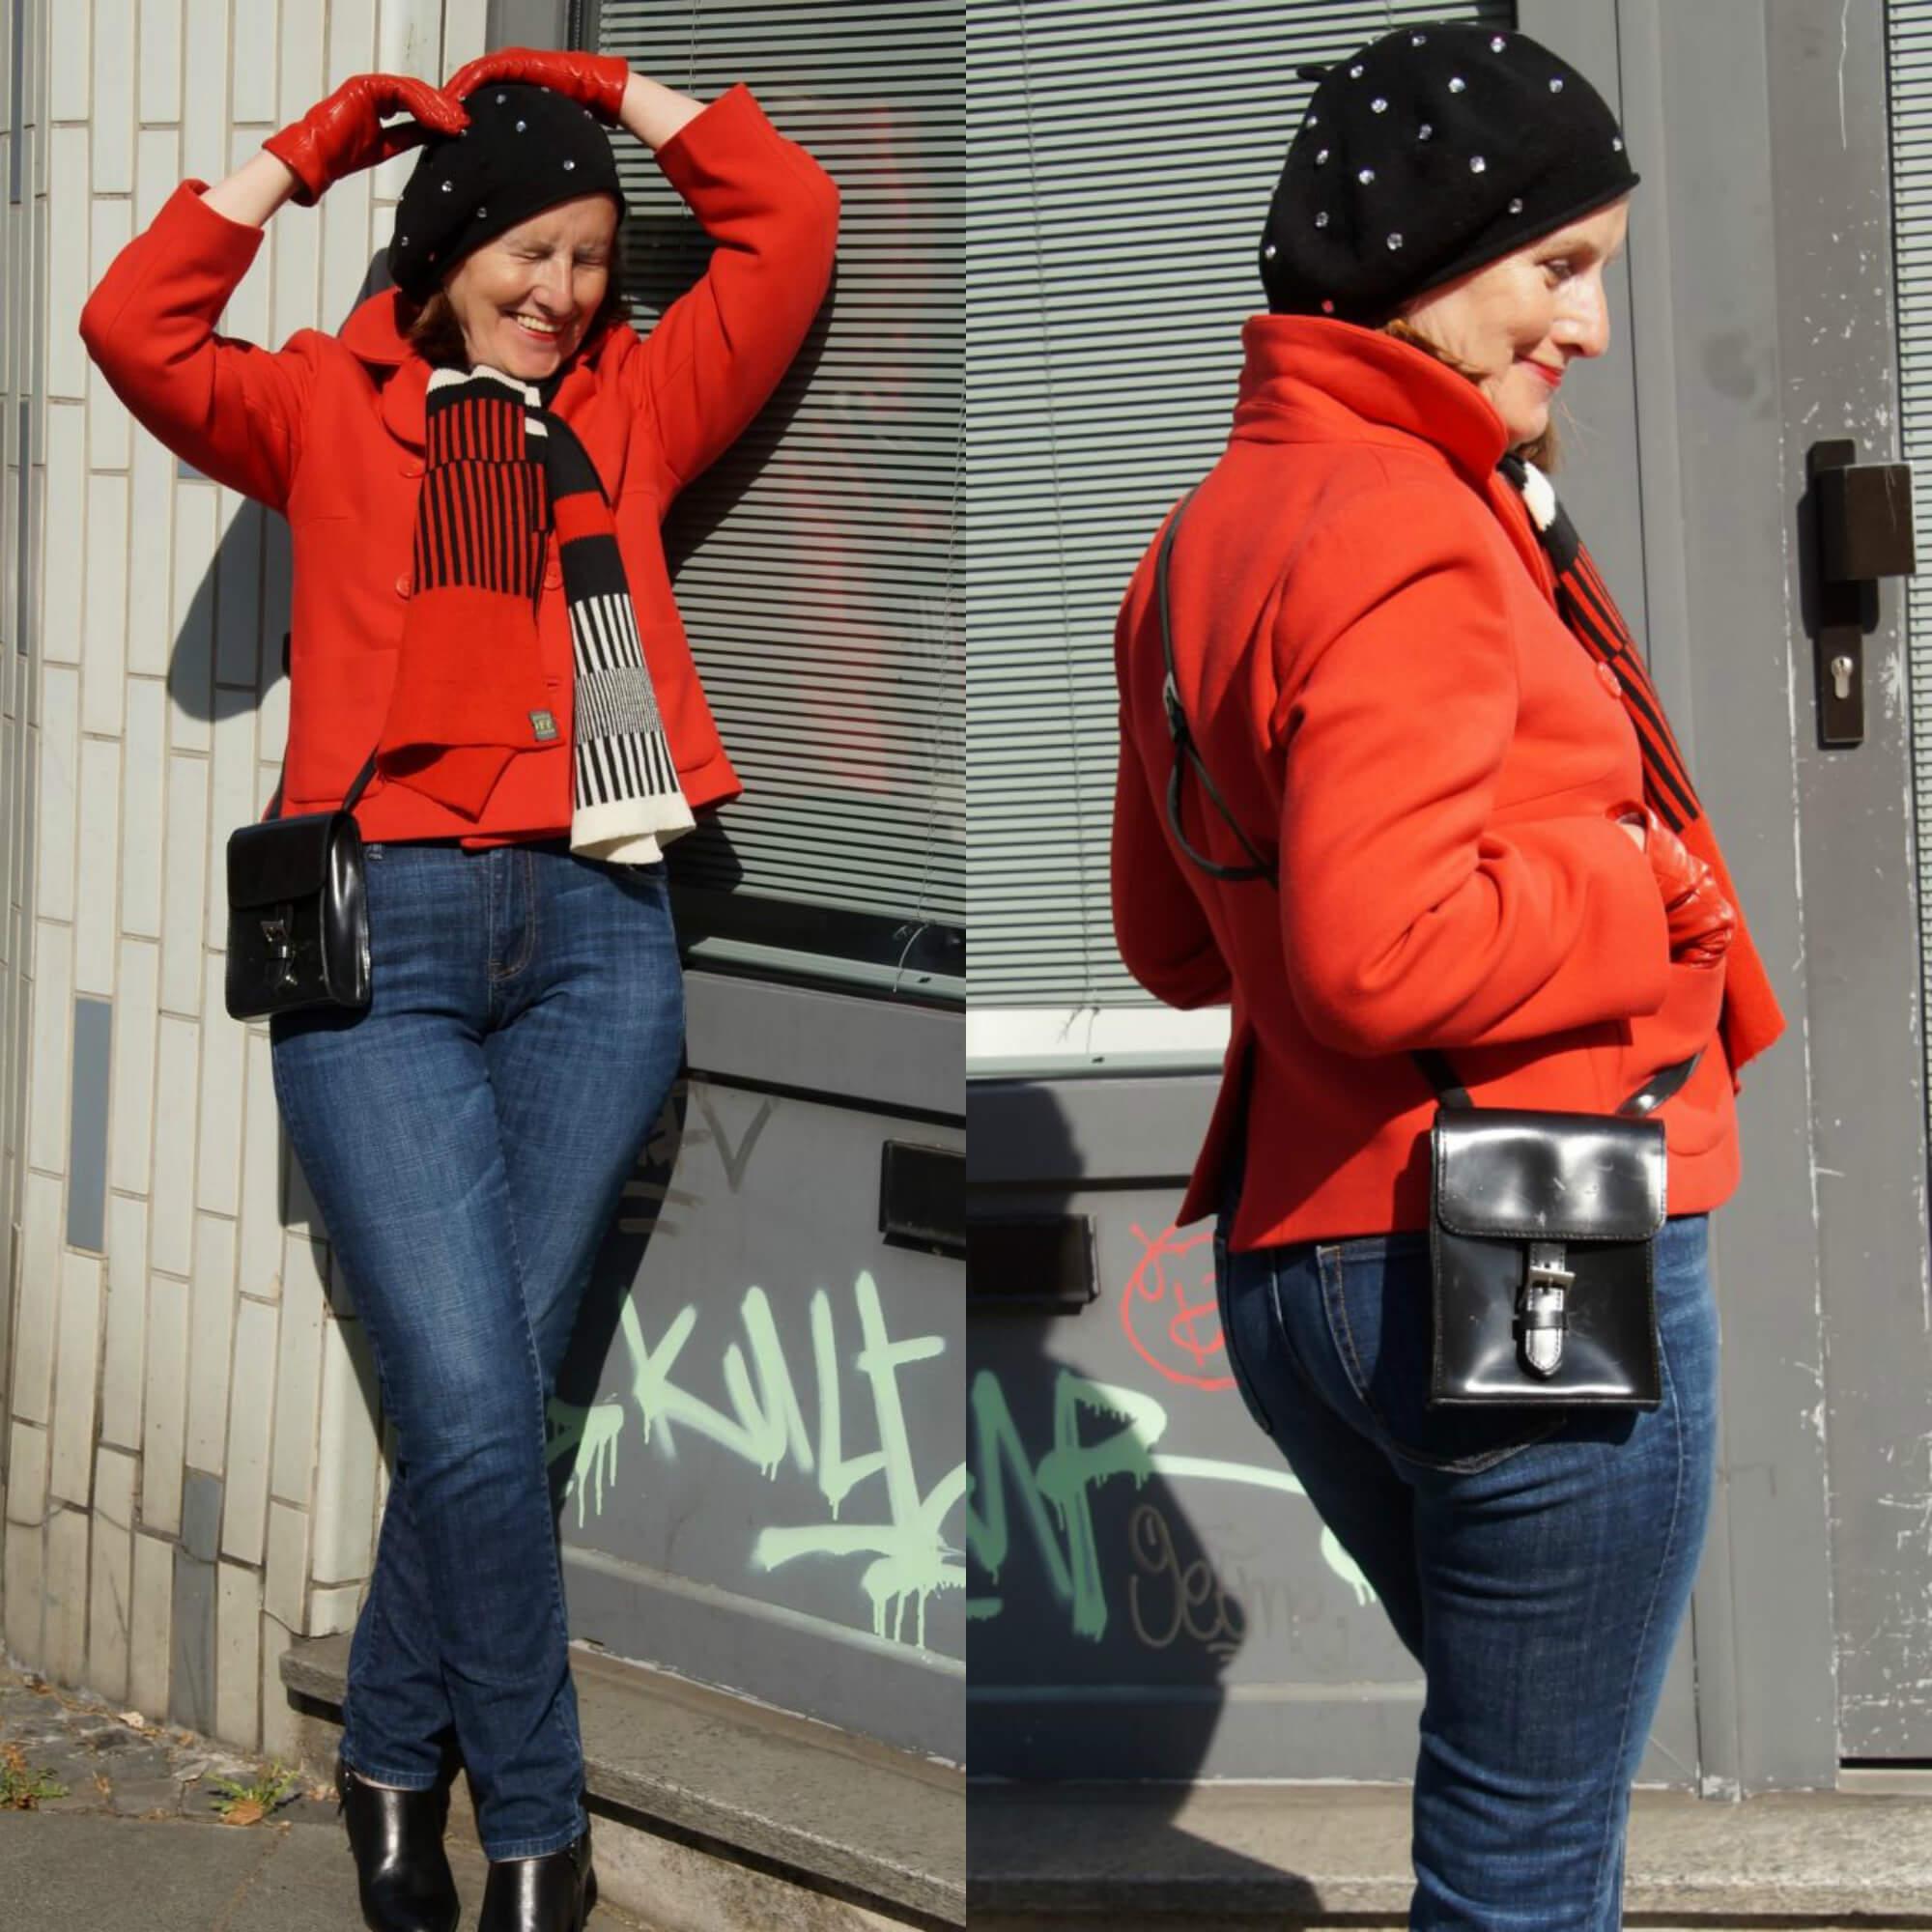 Jeans-der Retter in allen Lebenslagen